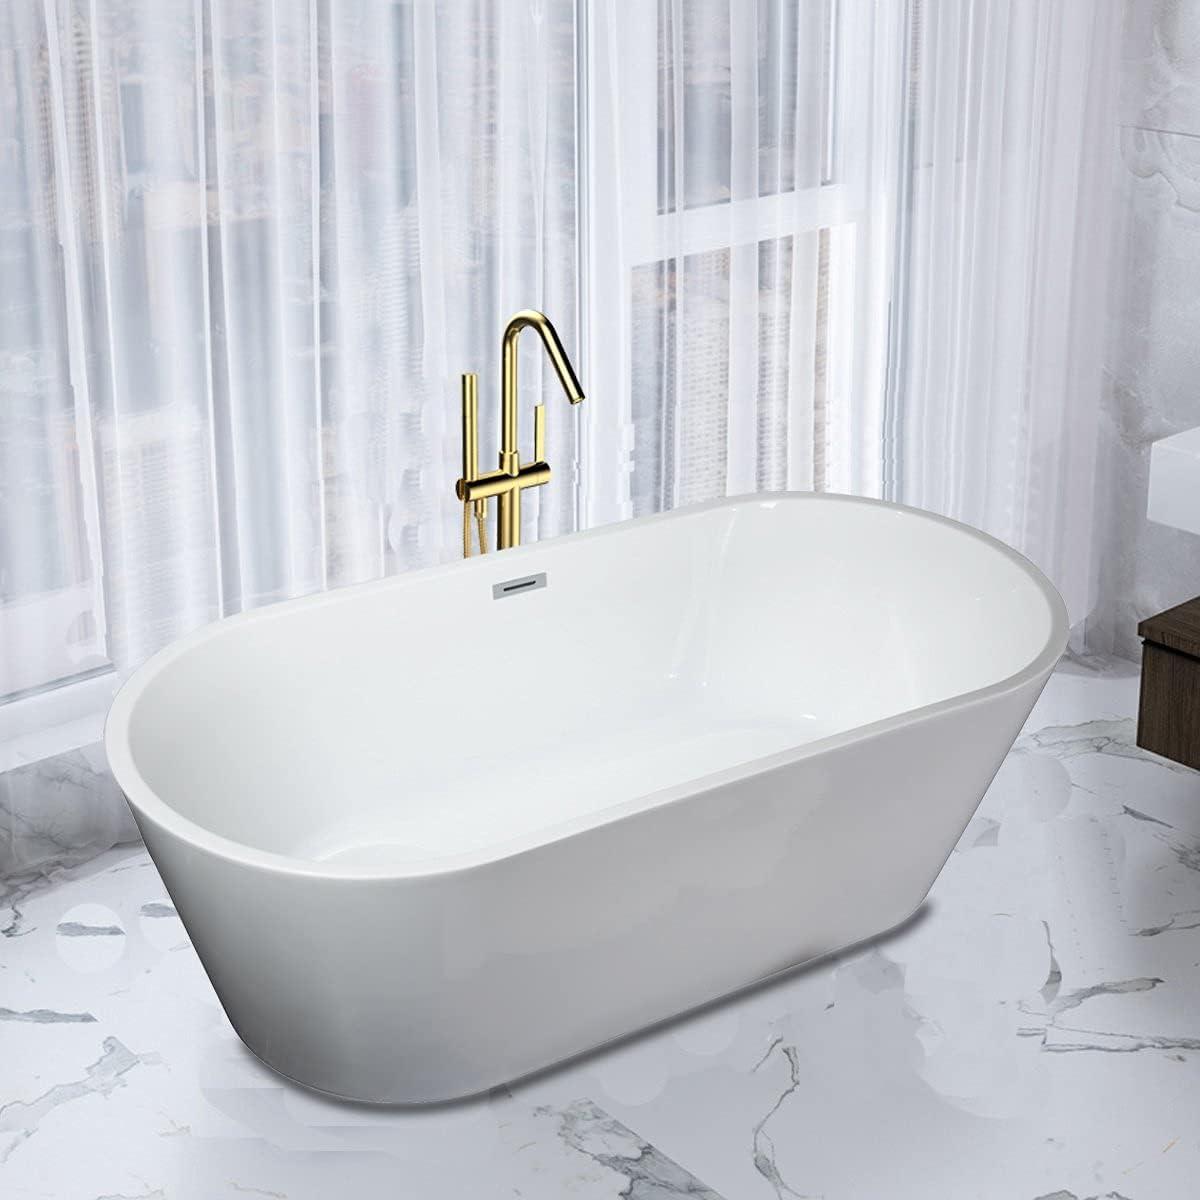 LOTTARE KZ-66028319 Max 90% OFF Bathtub Freestanding Cheap sale